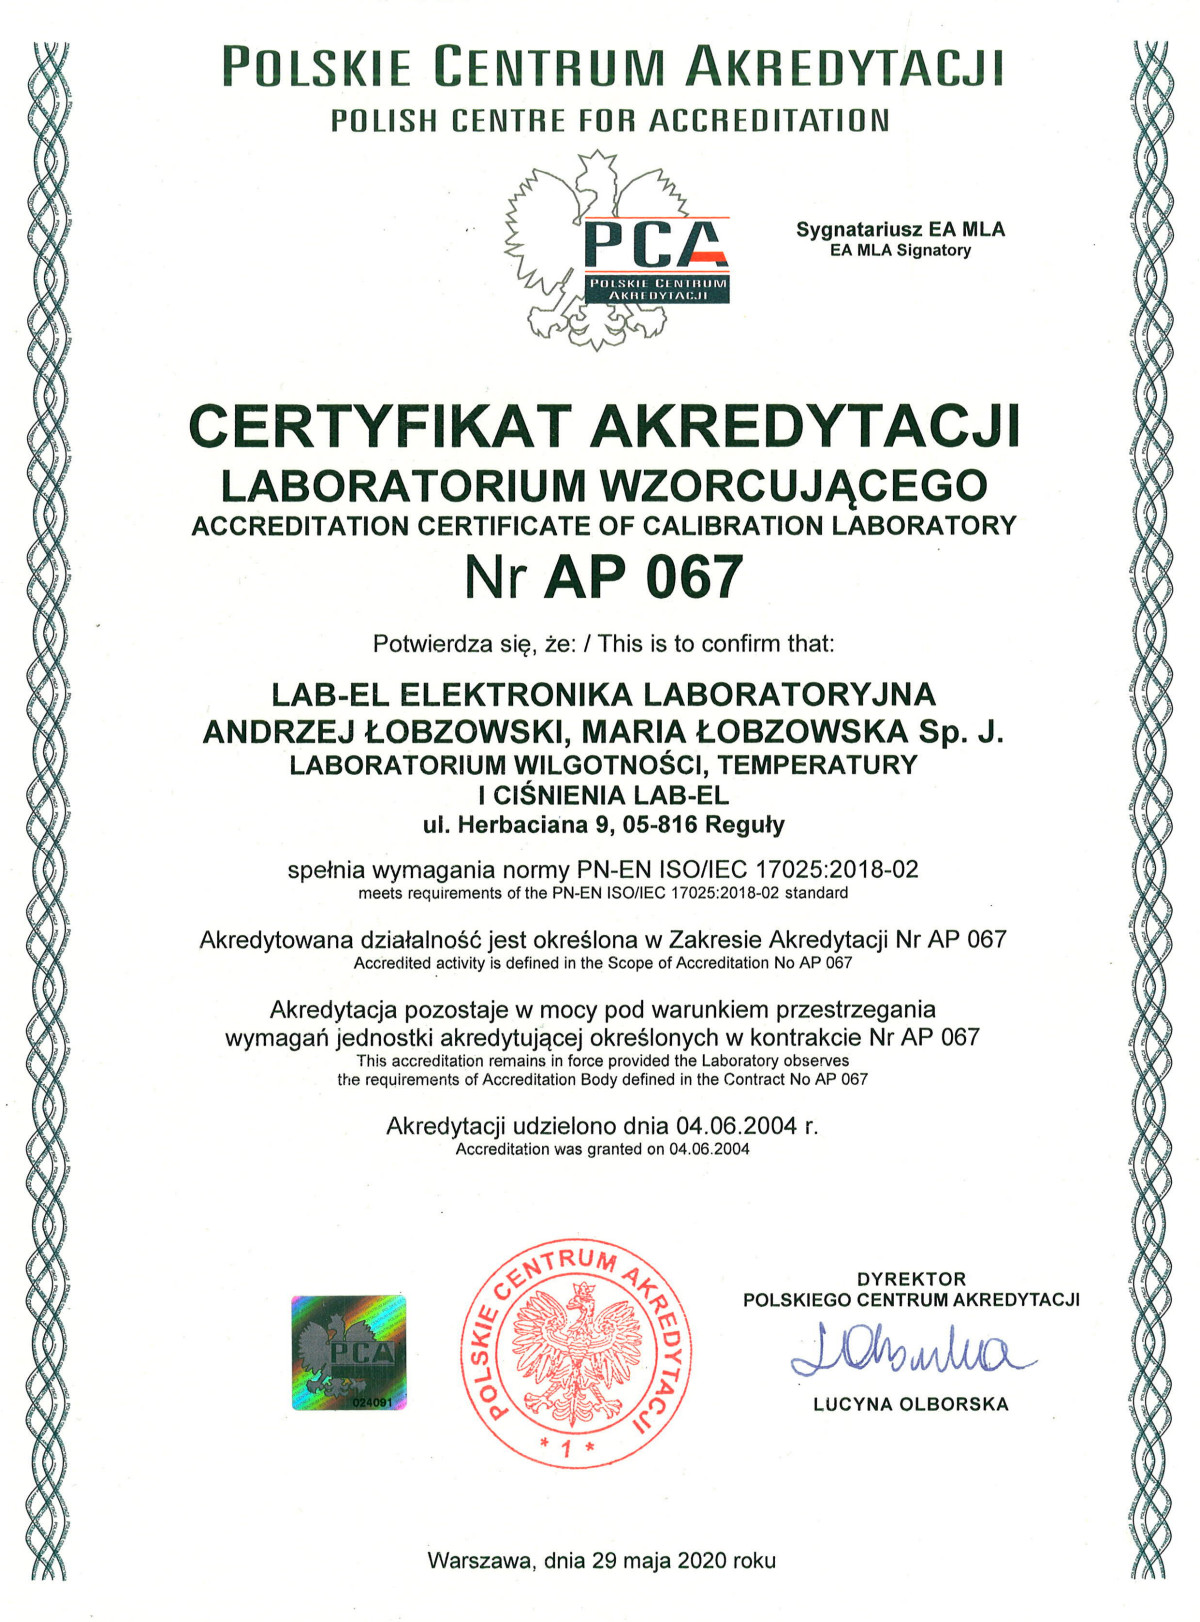 Certyfikat akredytacji nr AP 067